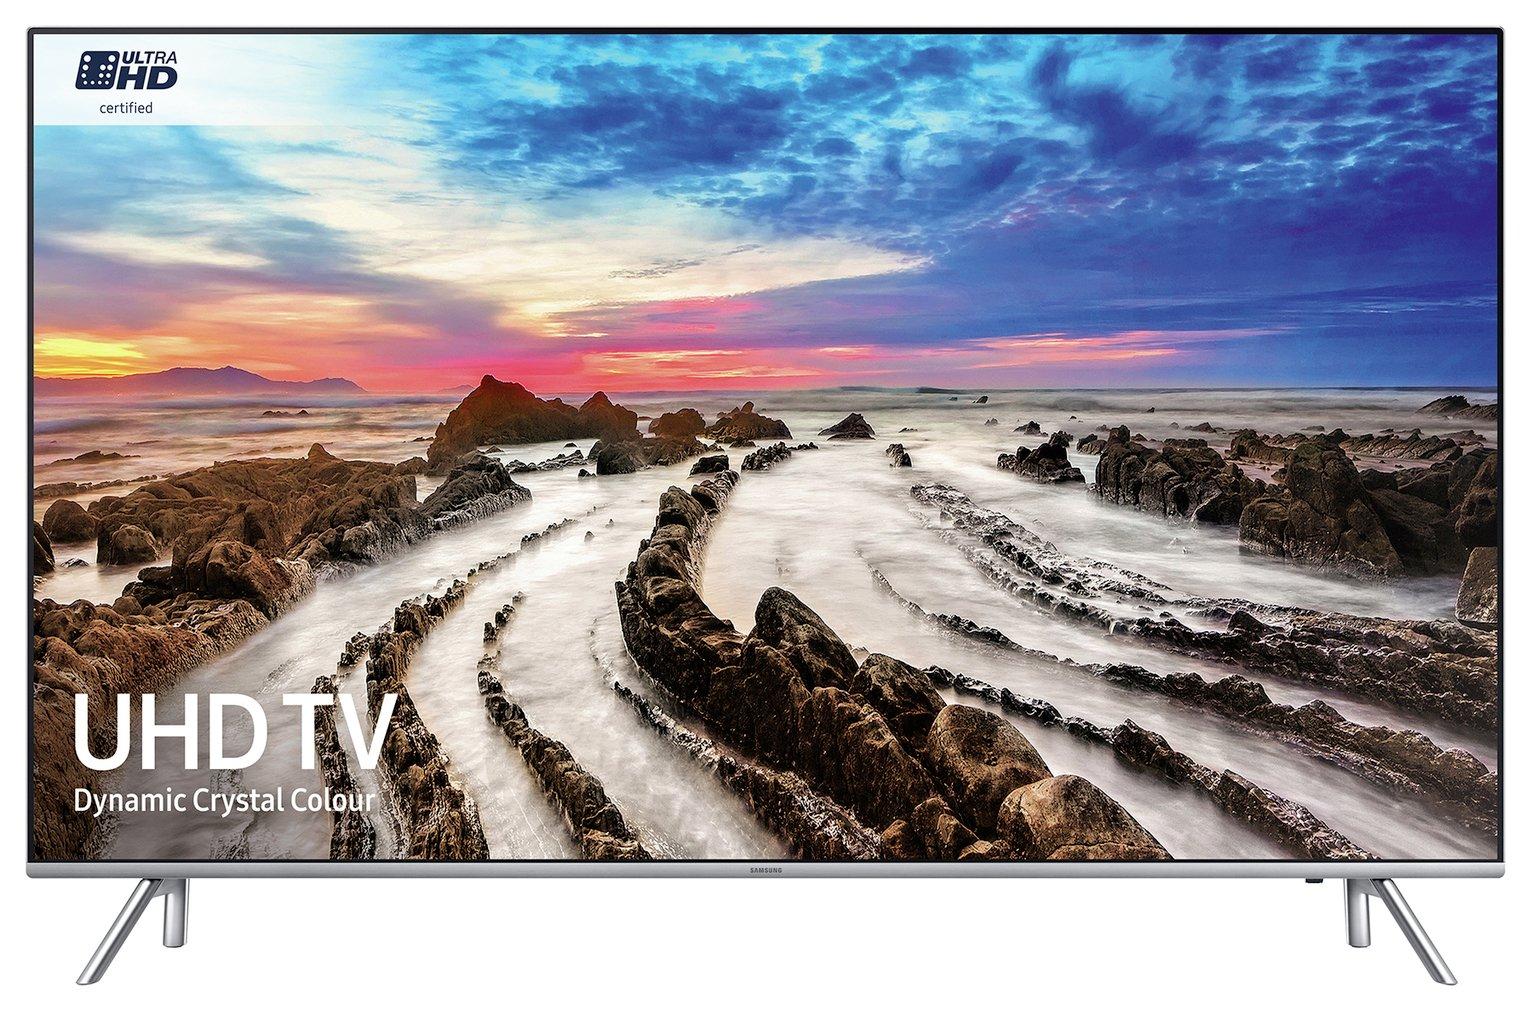 Samsung Samsung 55 Inch 55MU7000 Smart 4K UHD TV with HDR1000